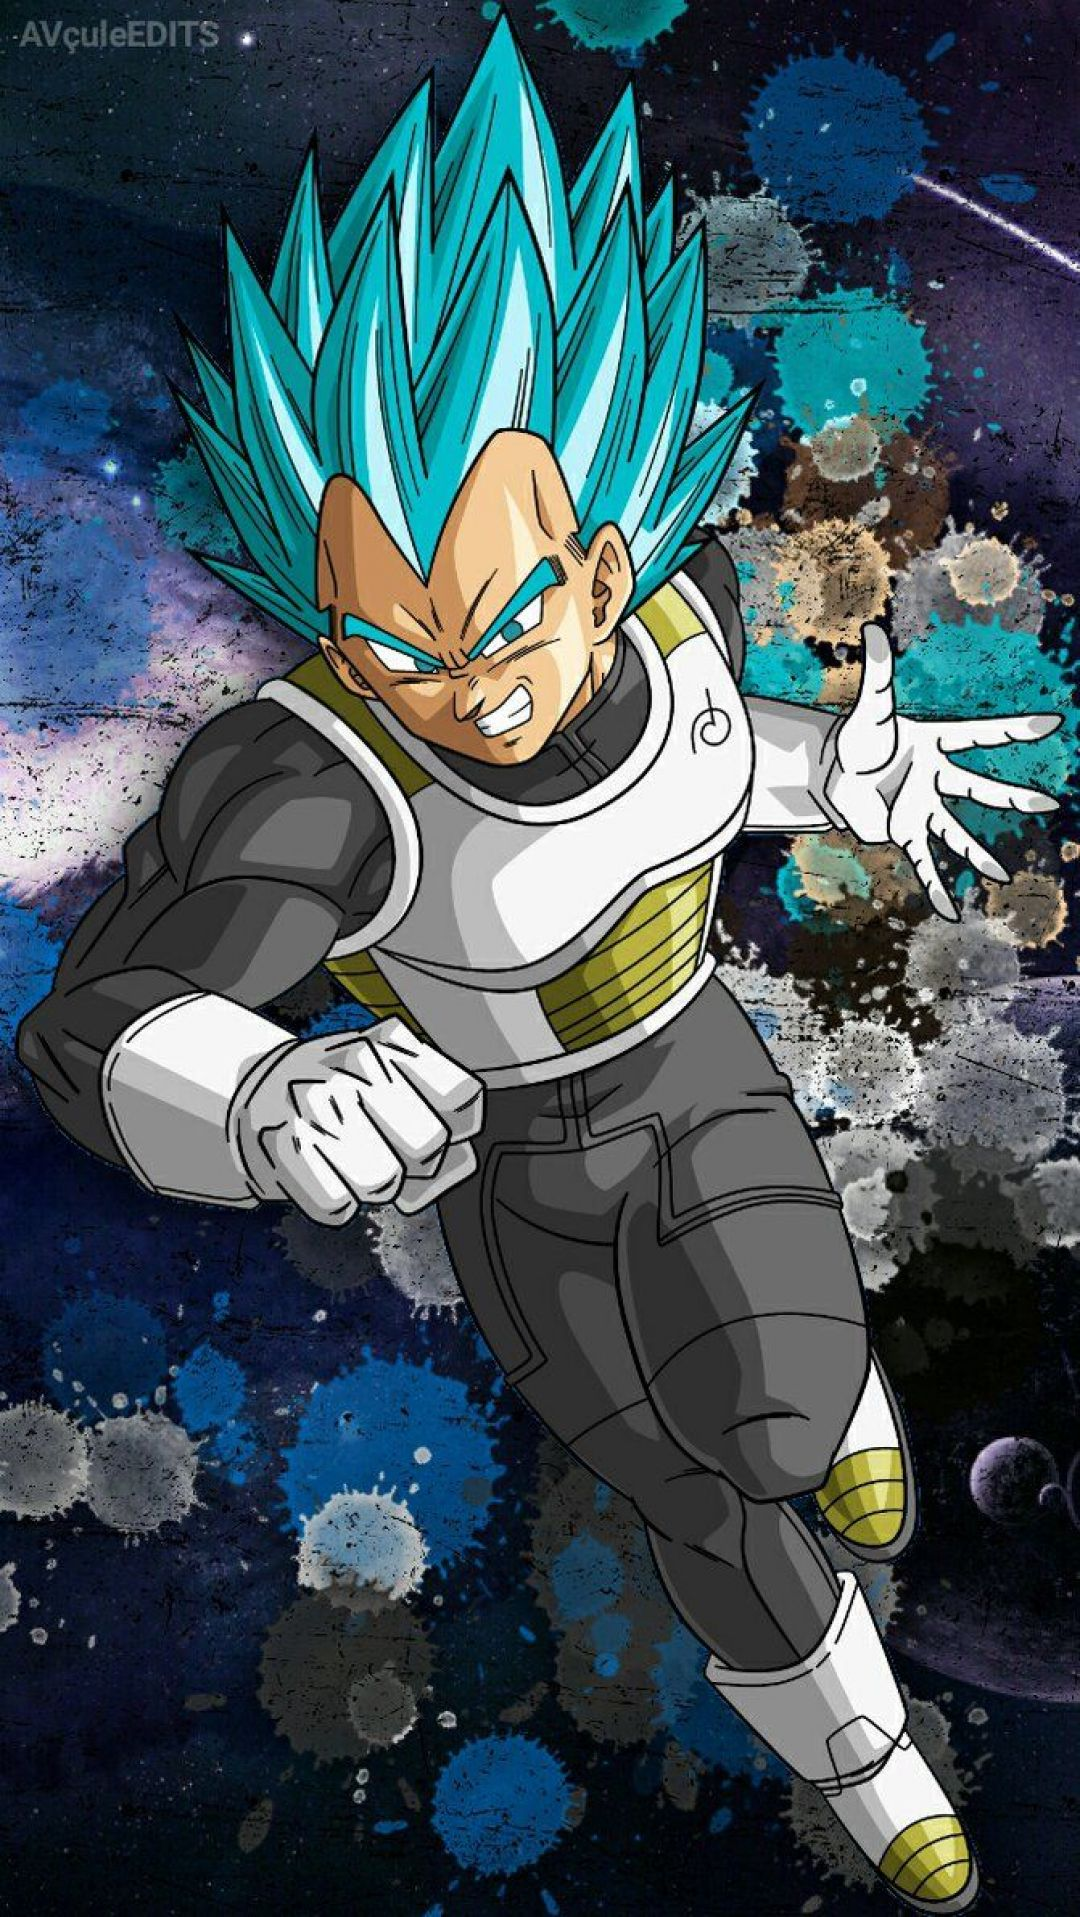 Android Iphone Desktop Hd Backgrounds Wallpapers Dragon Ball Super Vegeta Blue 3177209 Hd Wallpaper Backgrounds Download